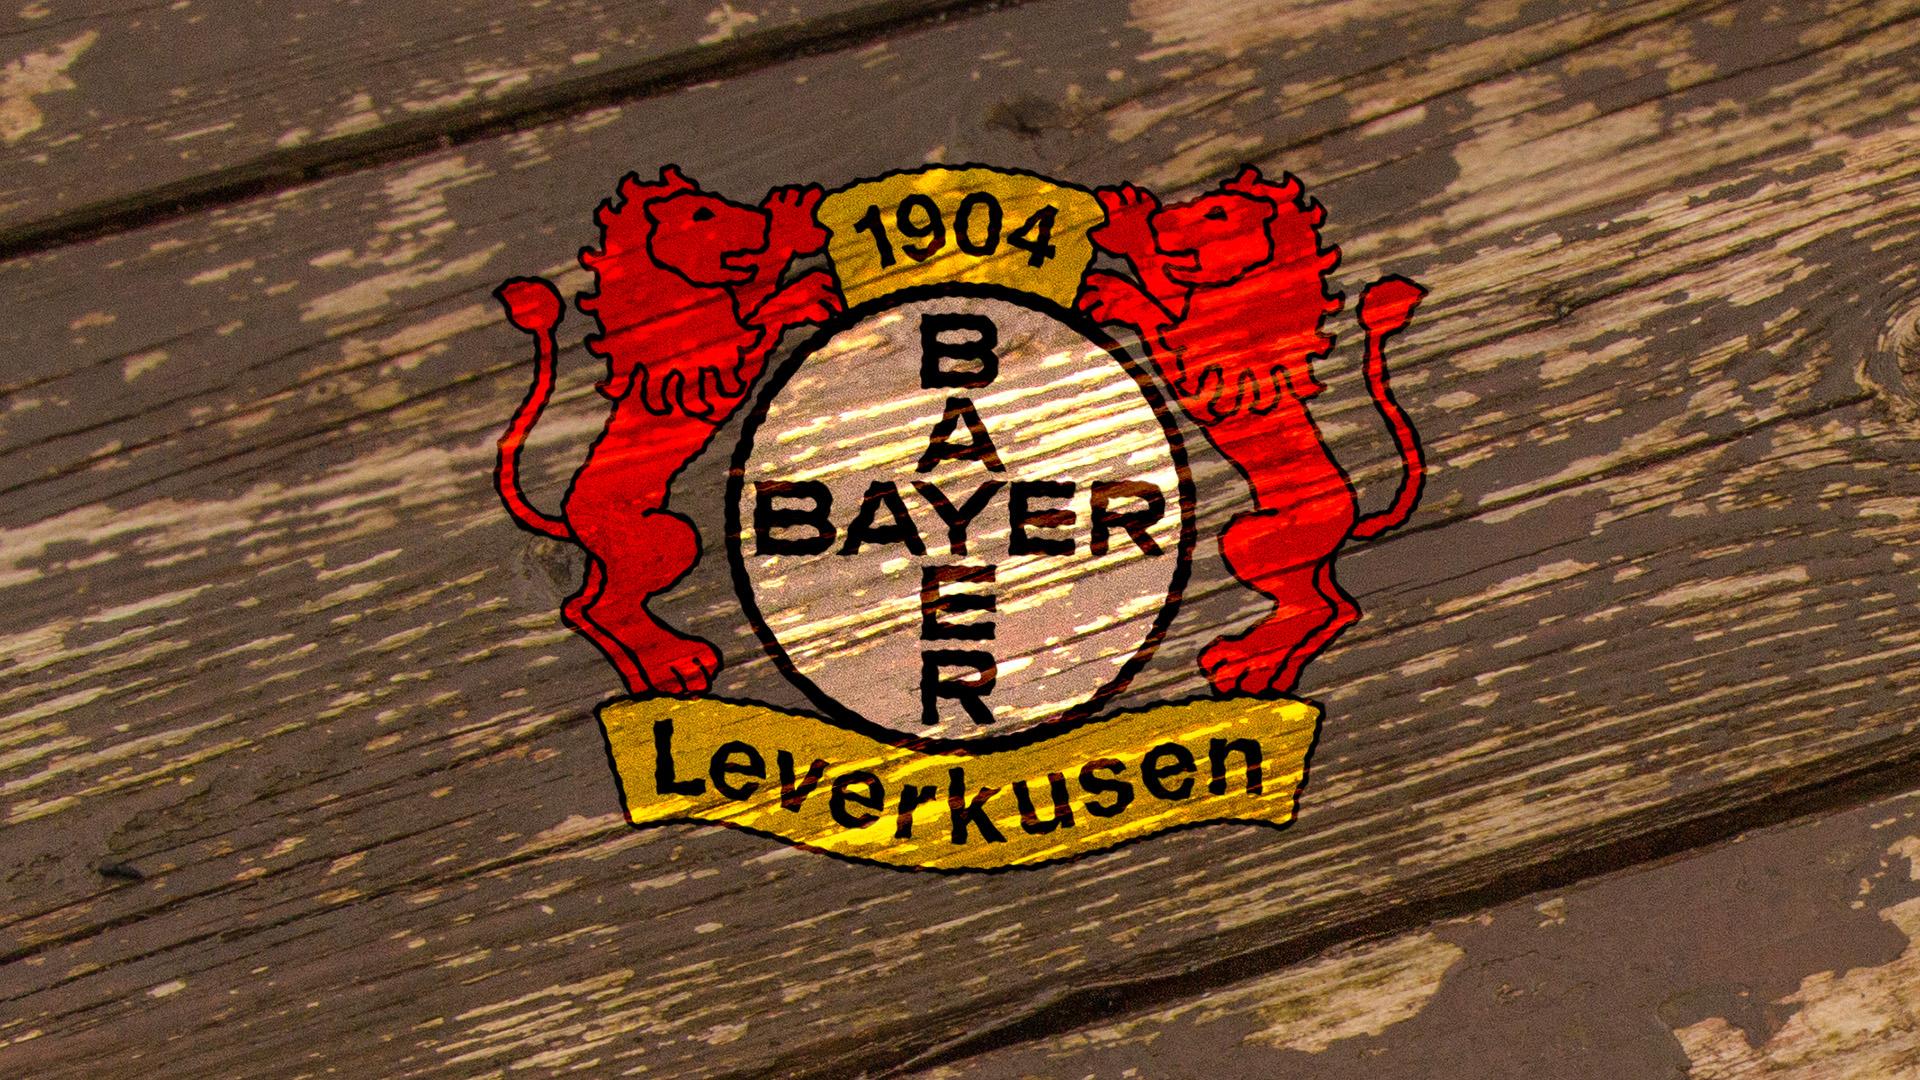 bayerleverkusen